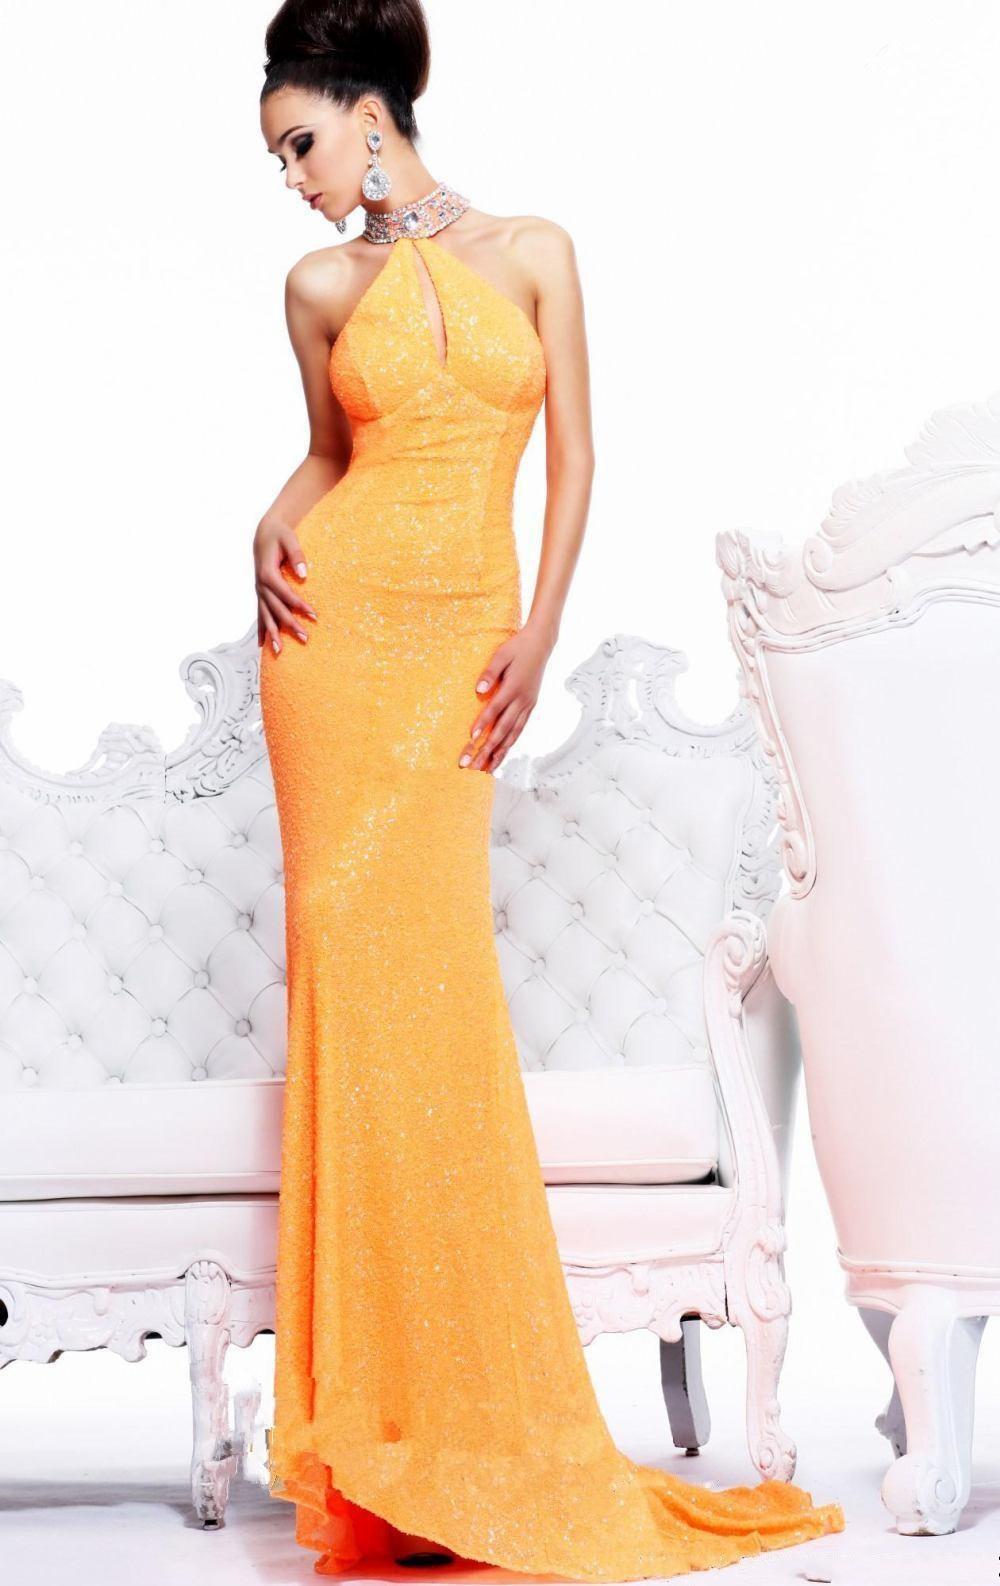 2018 new sexy Rhinestone vestido de festa crystal beaded slit style dress black long Evening gown party prom dress